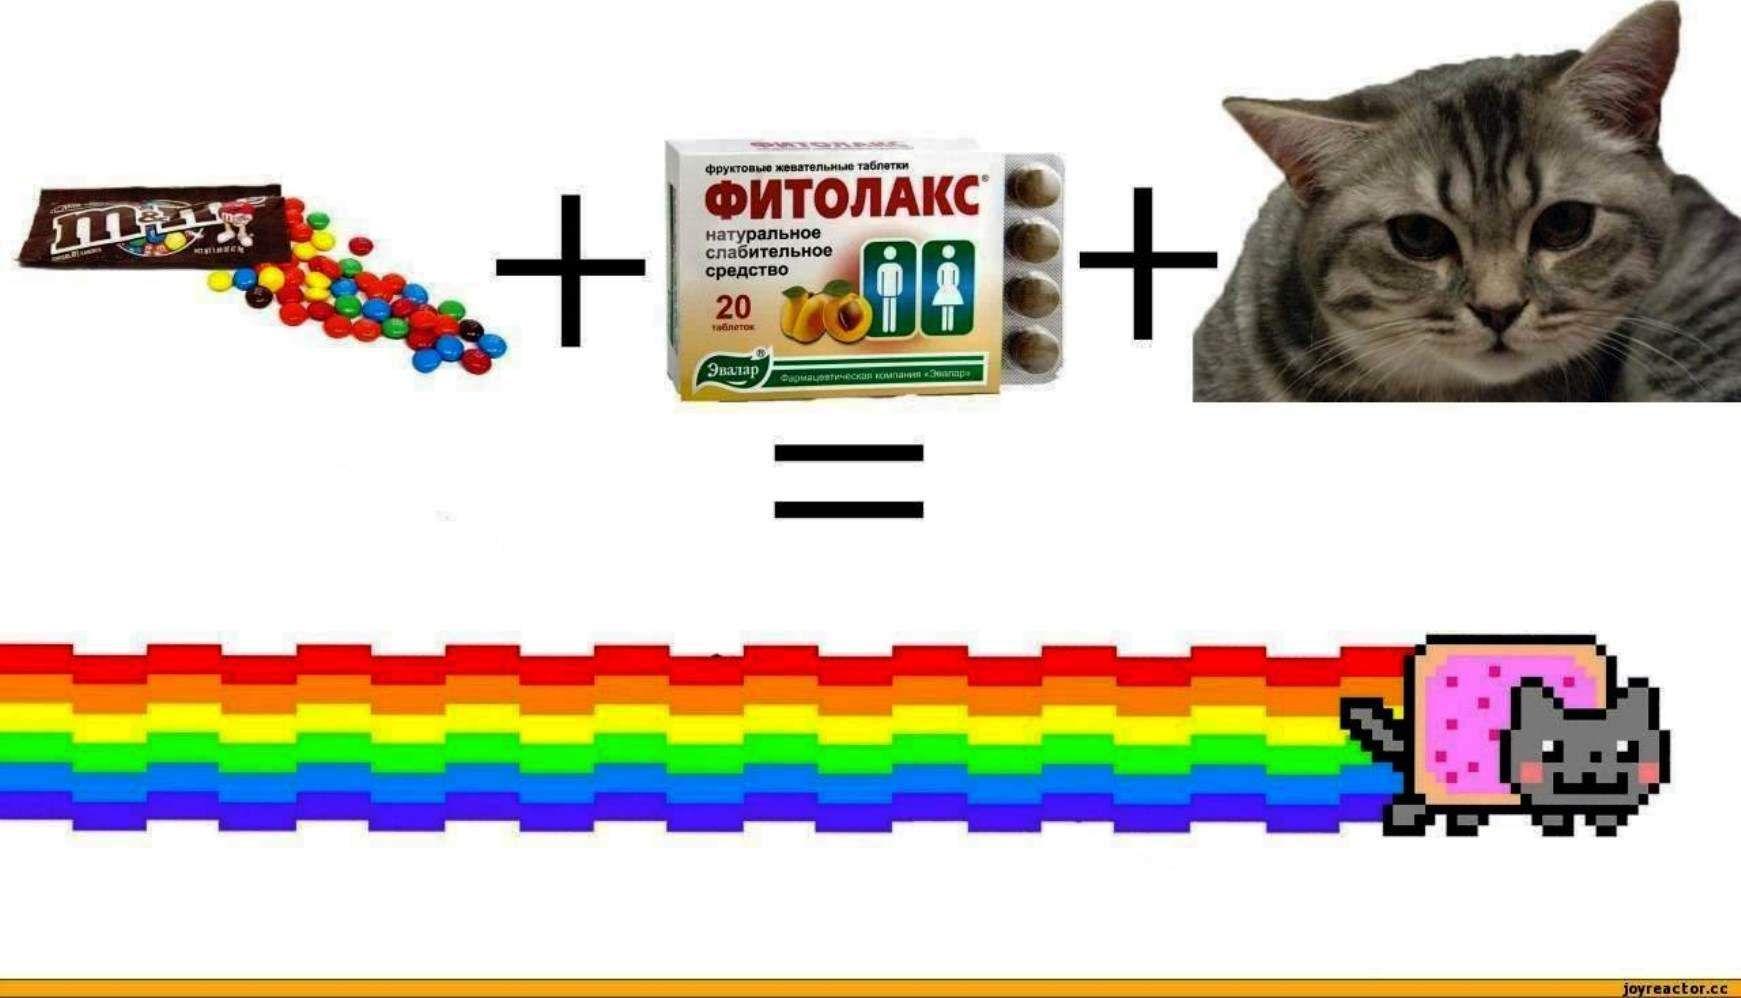 Simple Wallpaper Minecraft Cats - 2b3d007cf61a2501580aa83833424560  Pic_425330.jpg